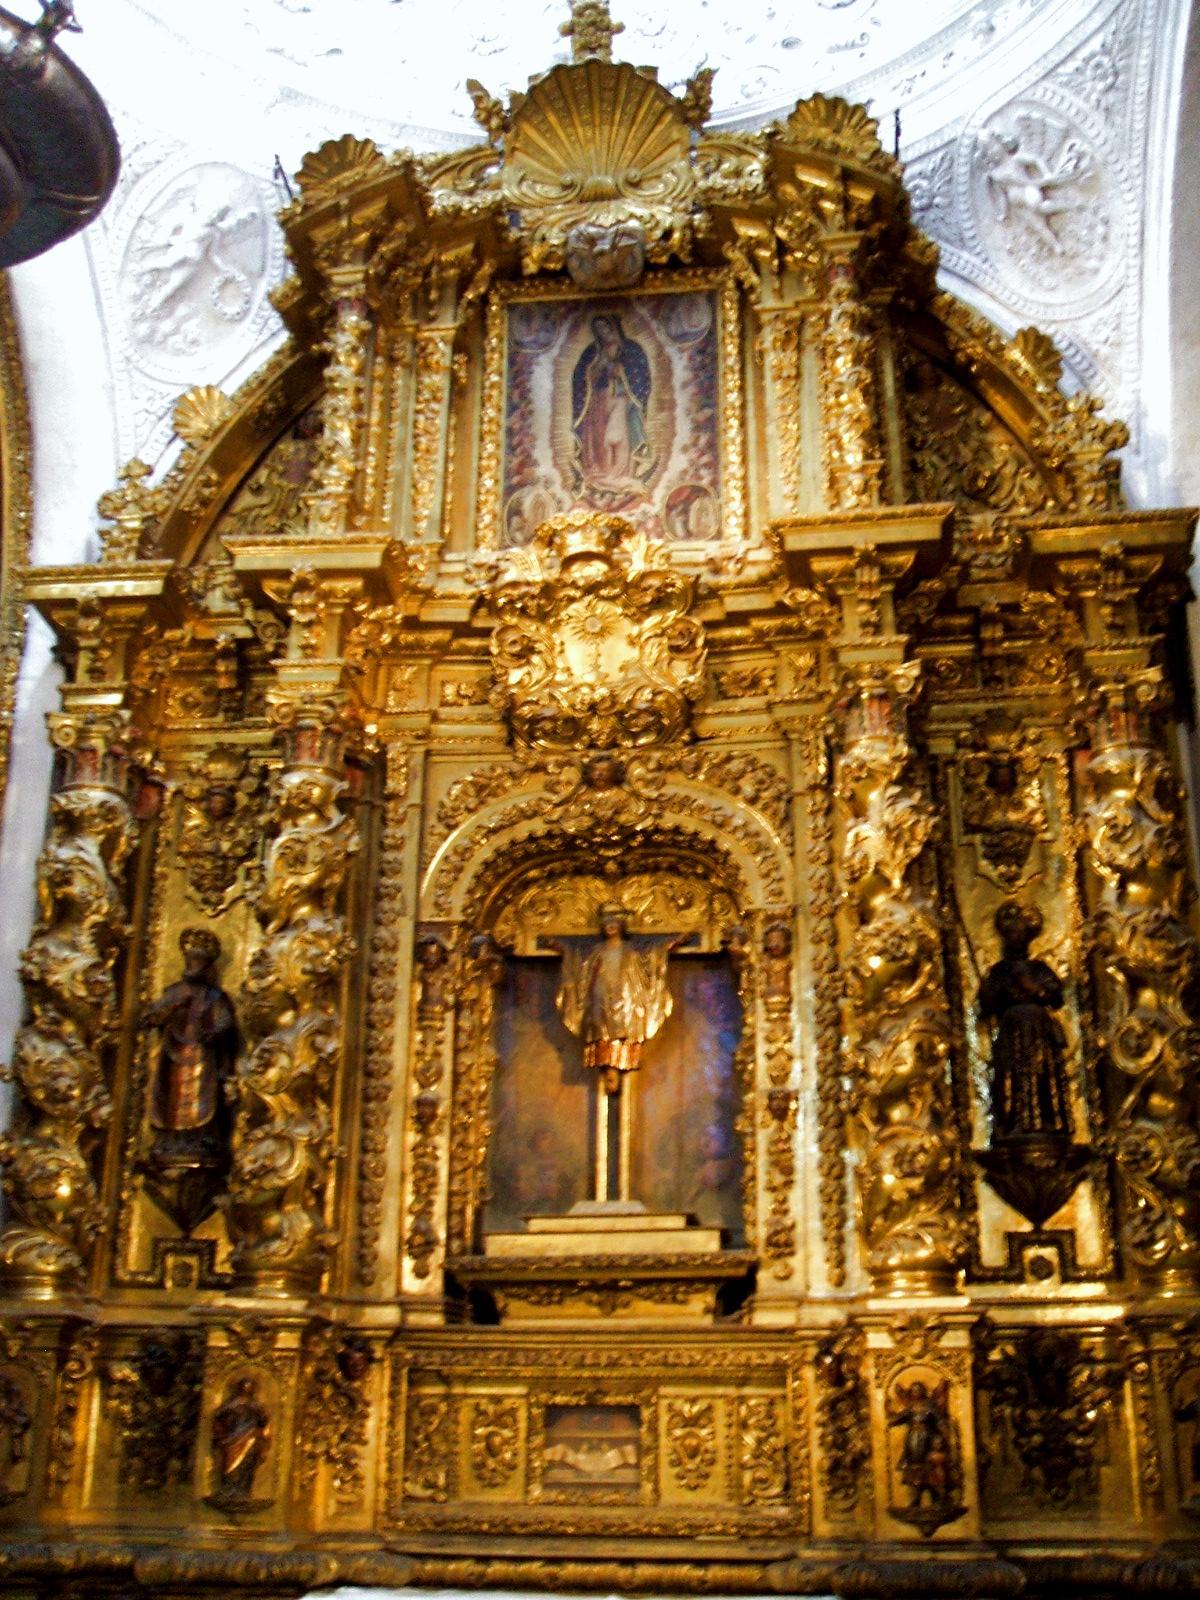 Zaragoza_-_La_Seo_09_-_Capilla_de_Santo_Dominguito_de_Val